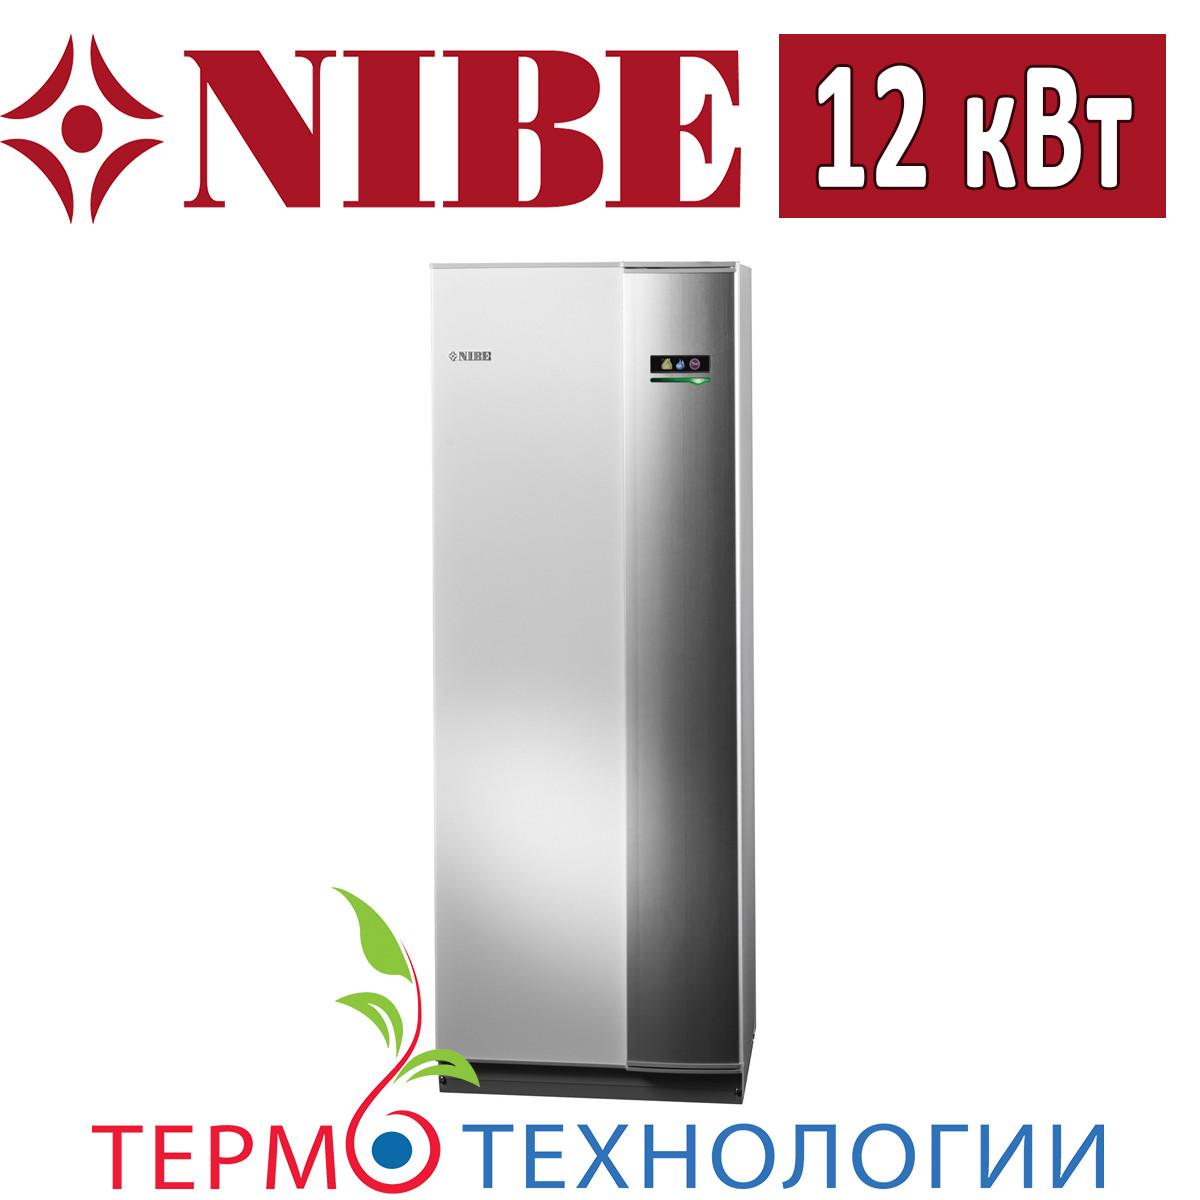 Тепловой насос грунт-вода Nibe F-1155 12 кВт